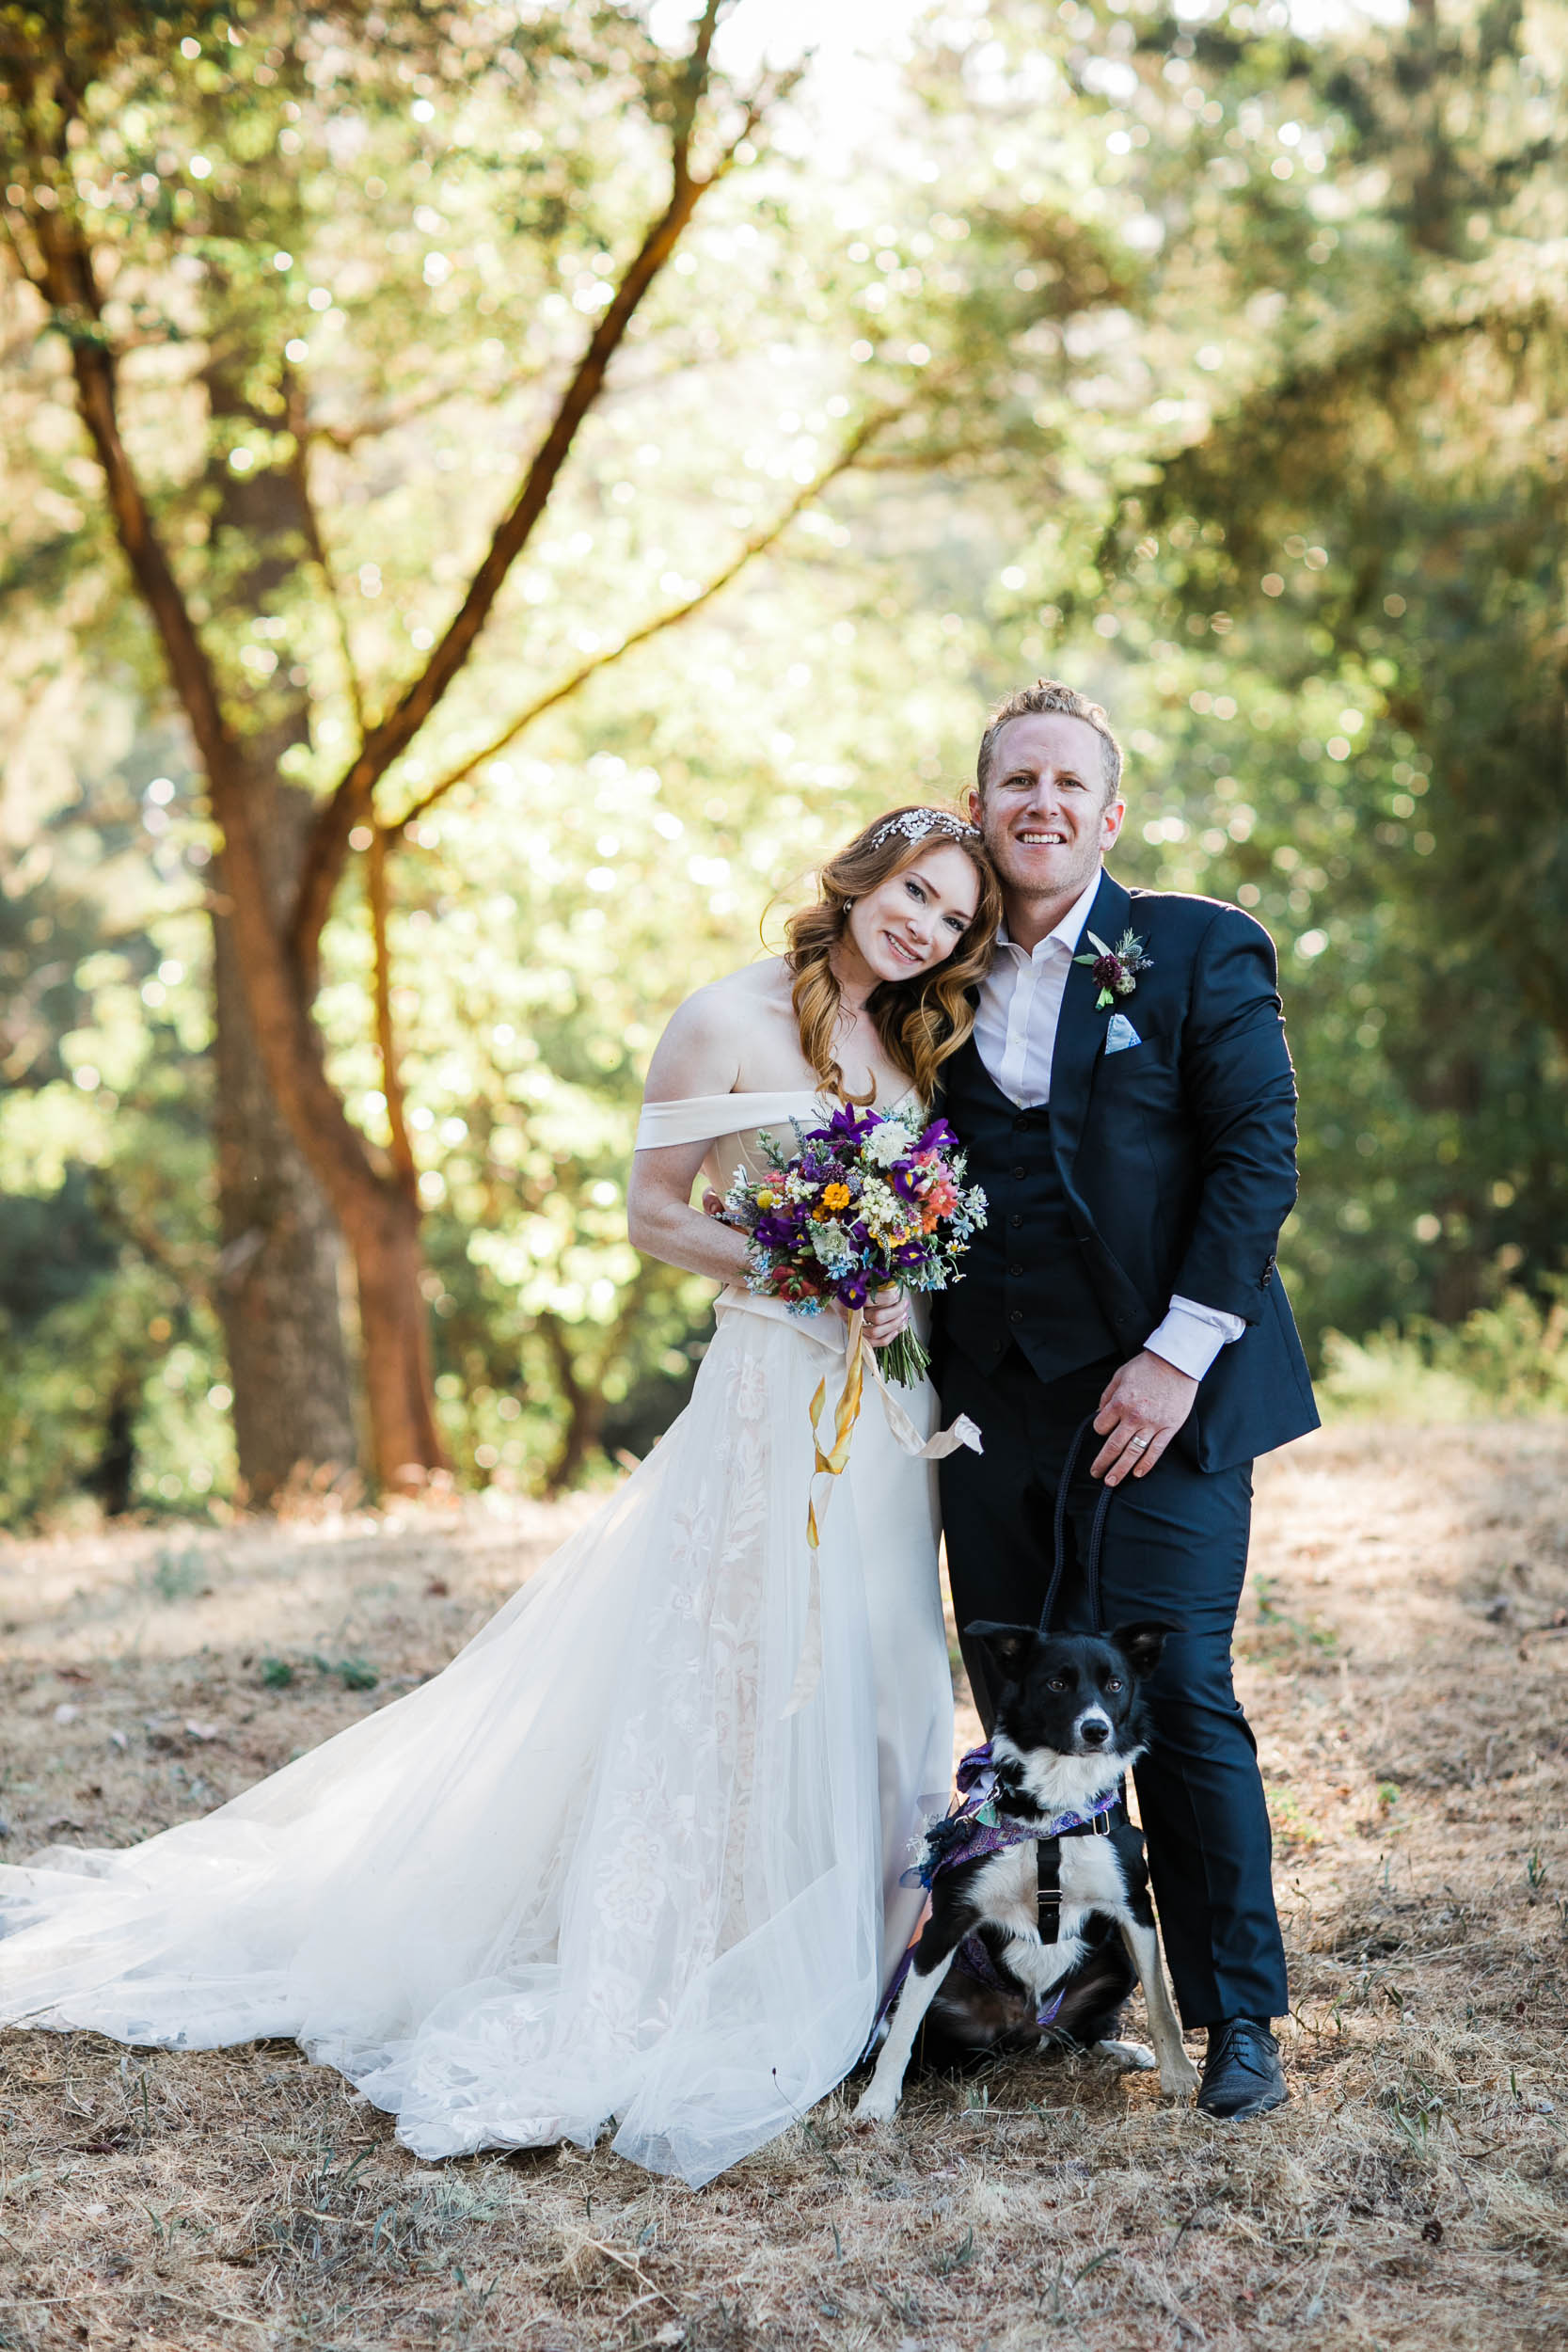 10717_A+C_Wild Iris Philo Wedding_Buena Lane Photography_1441ER.jpg